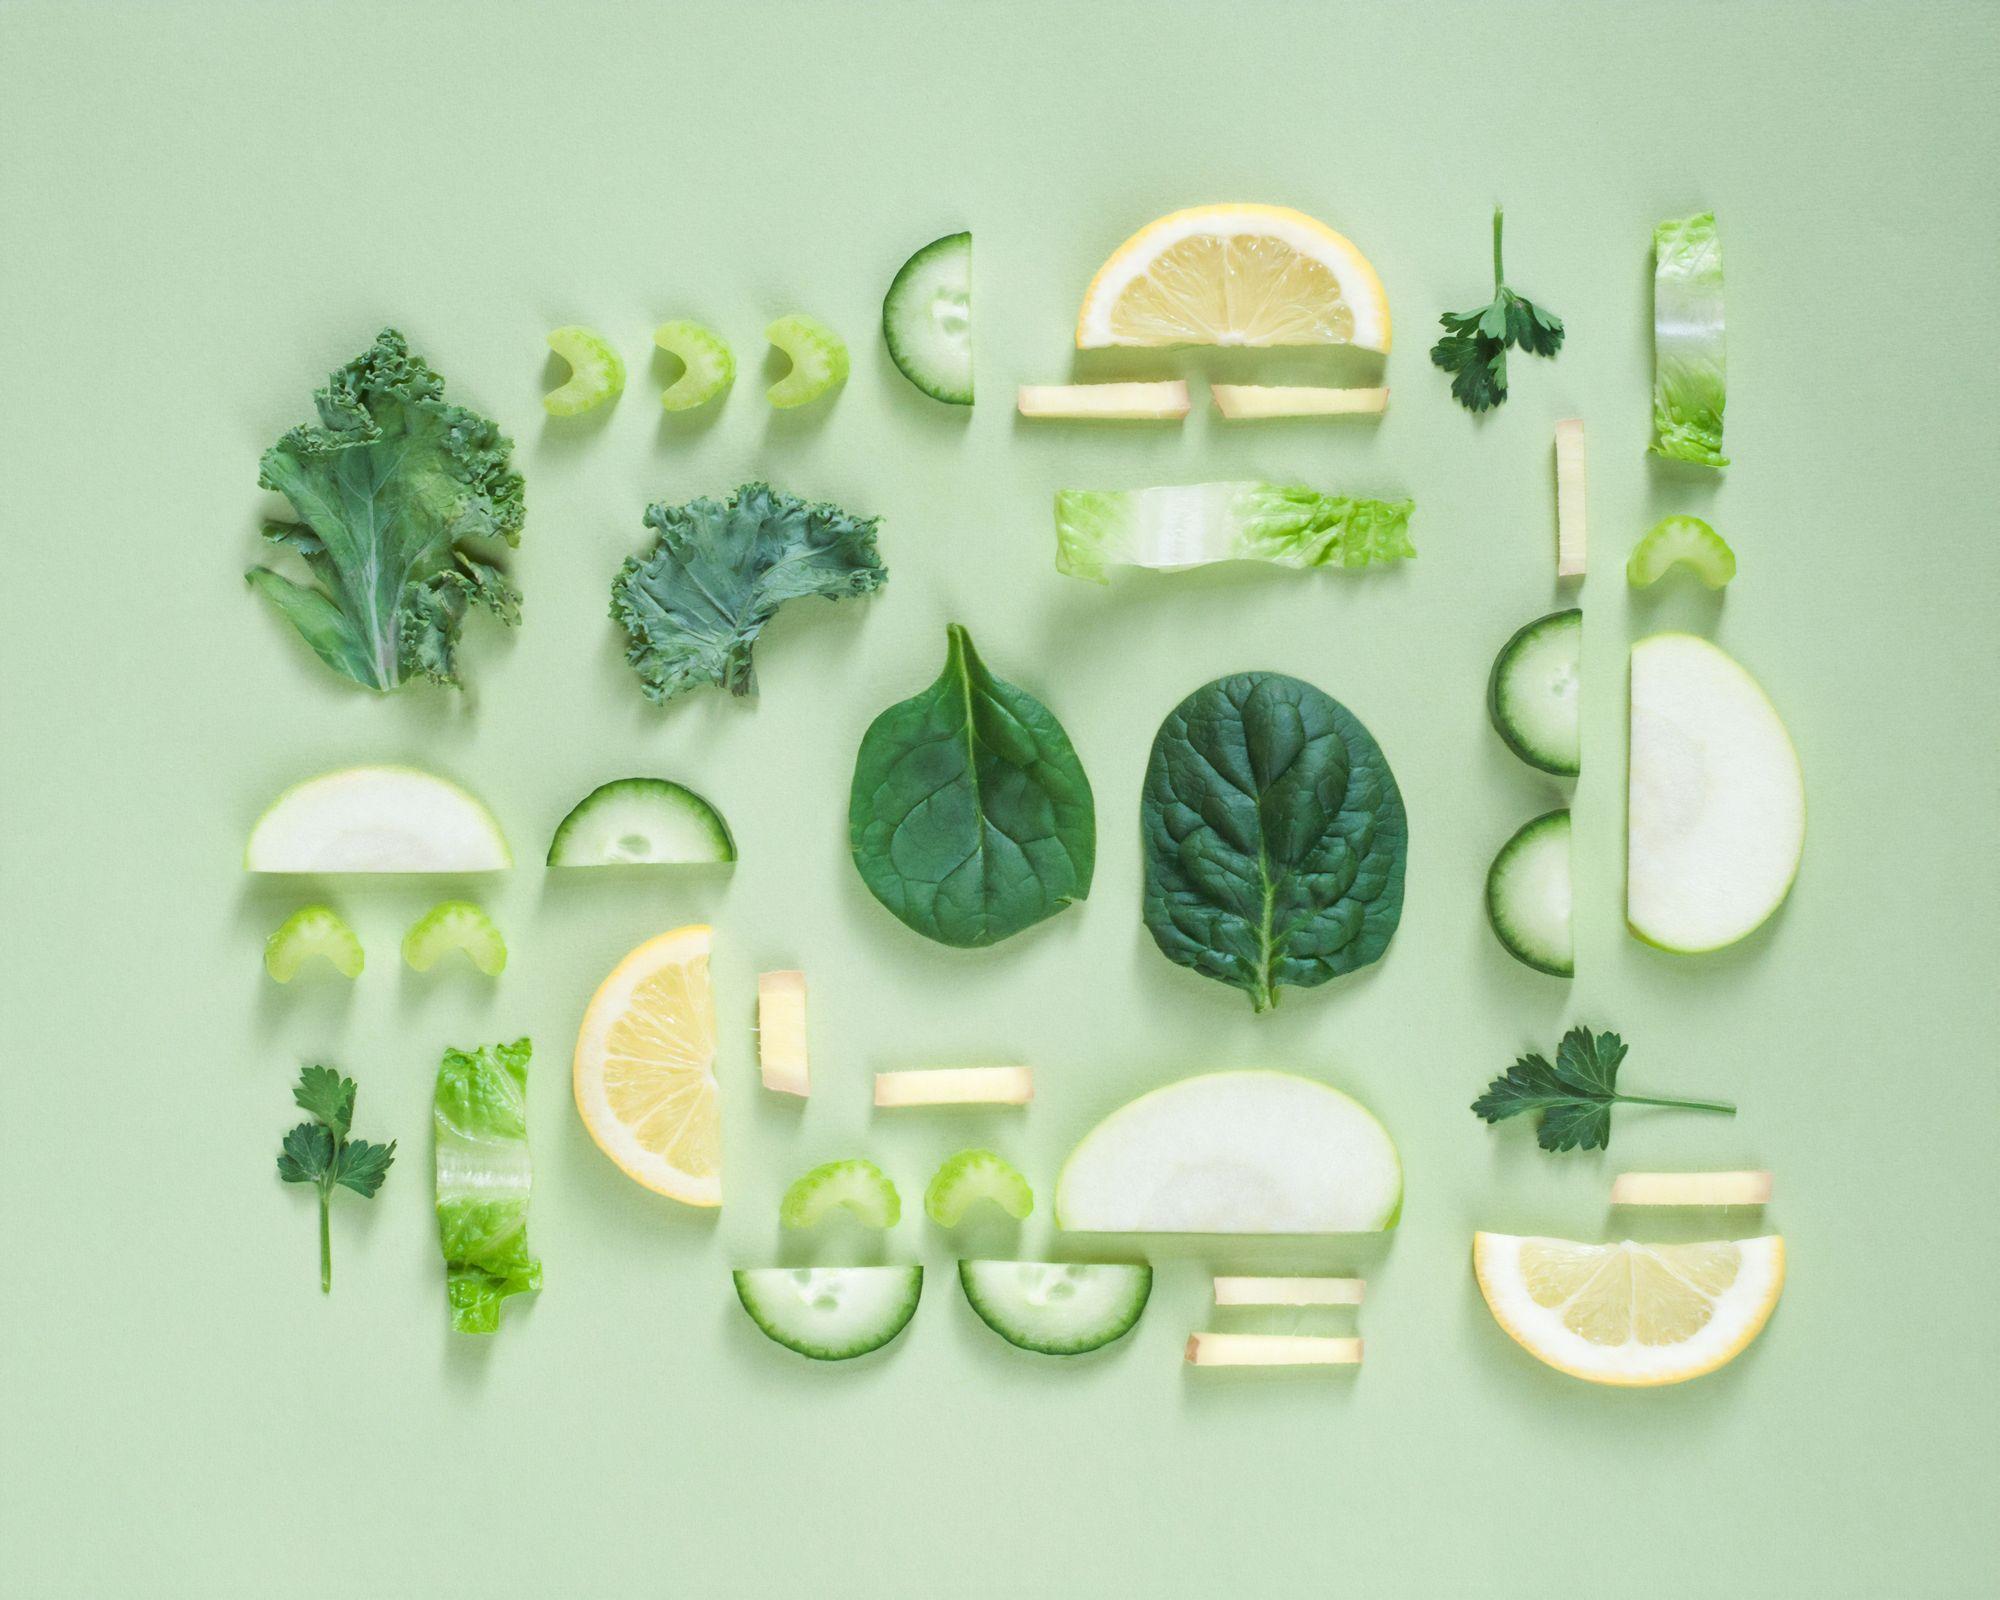 Vitamin K is abundant in green vegetables by Dose Juice for Unsplash.